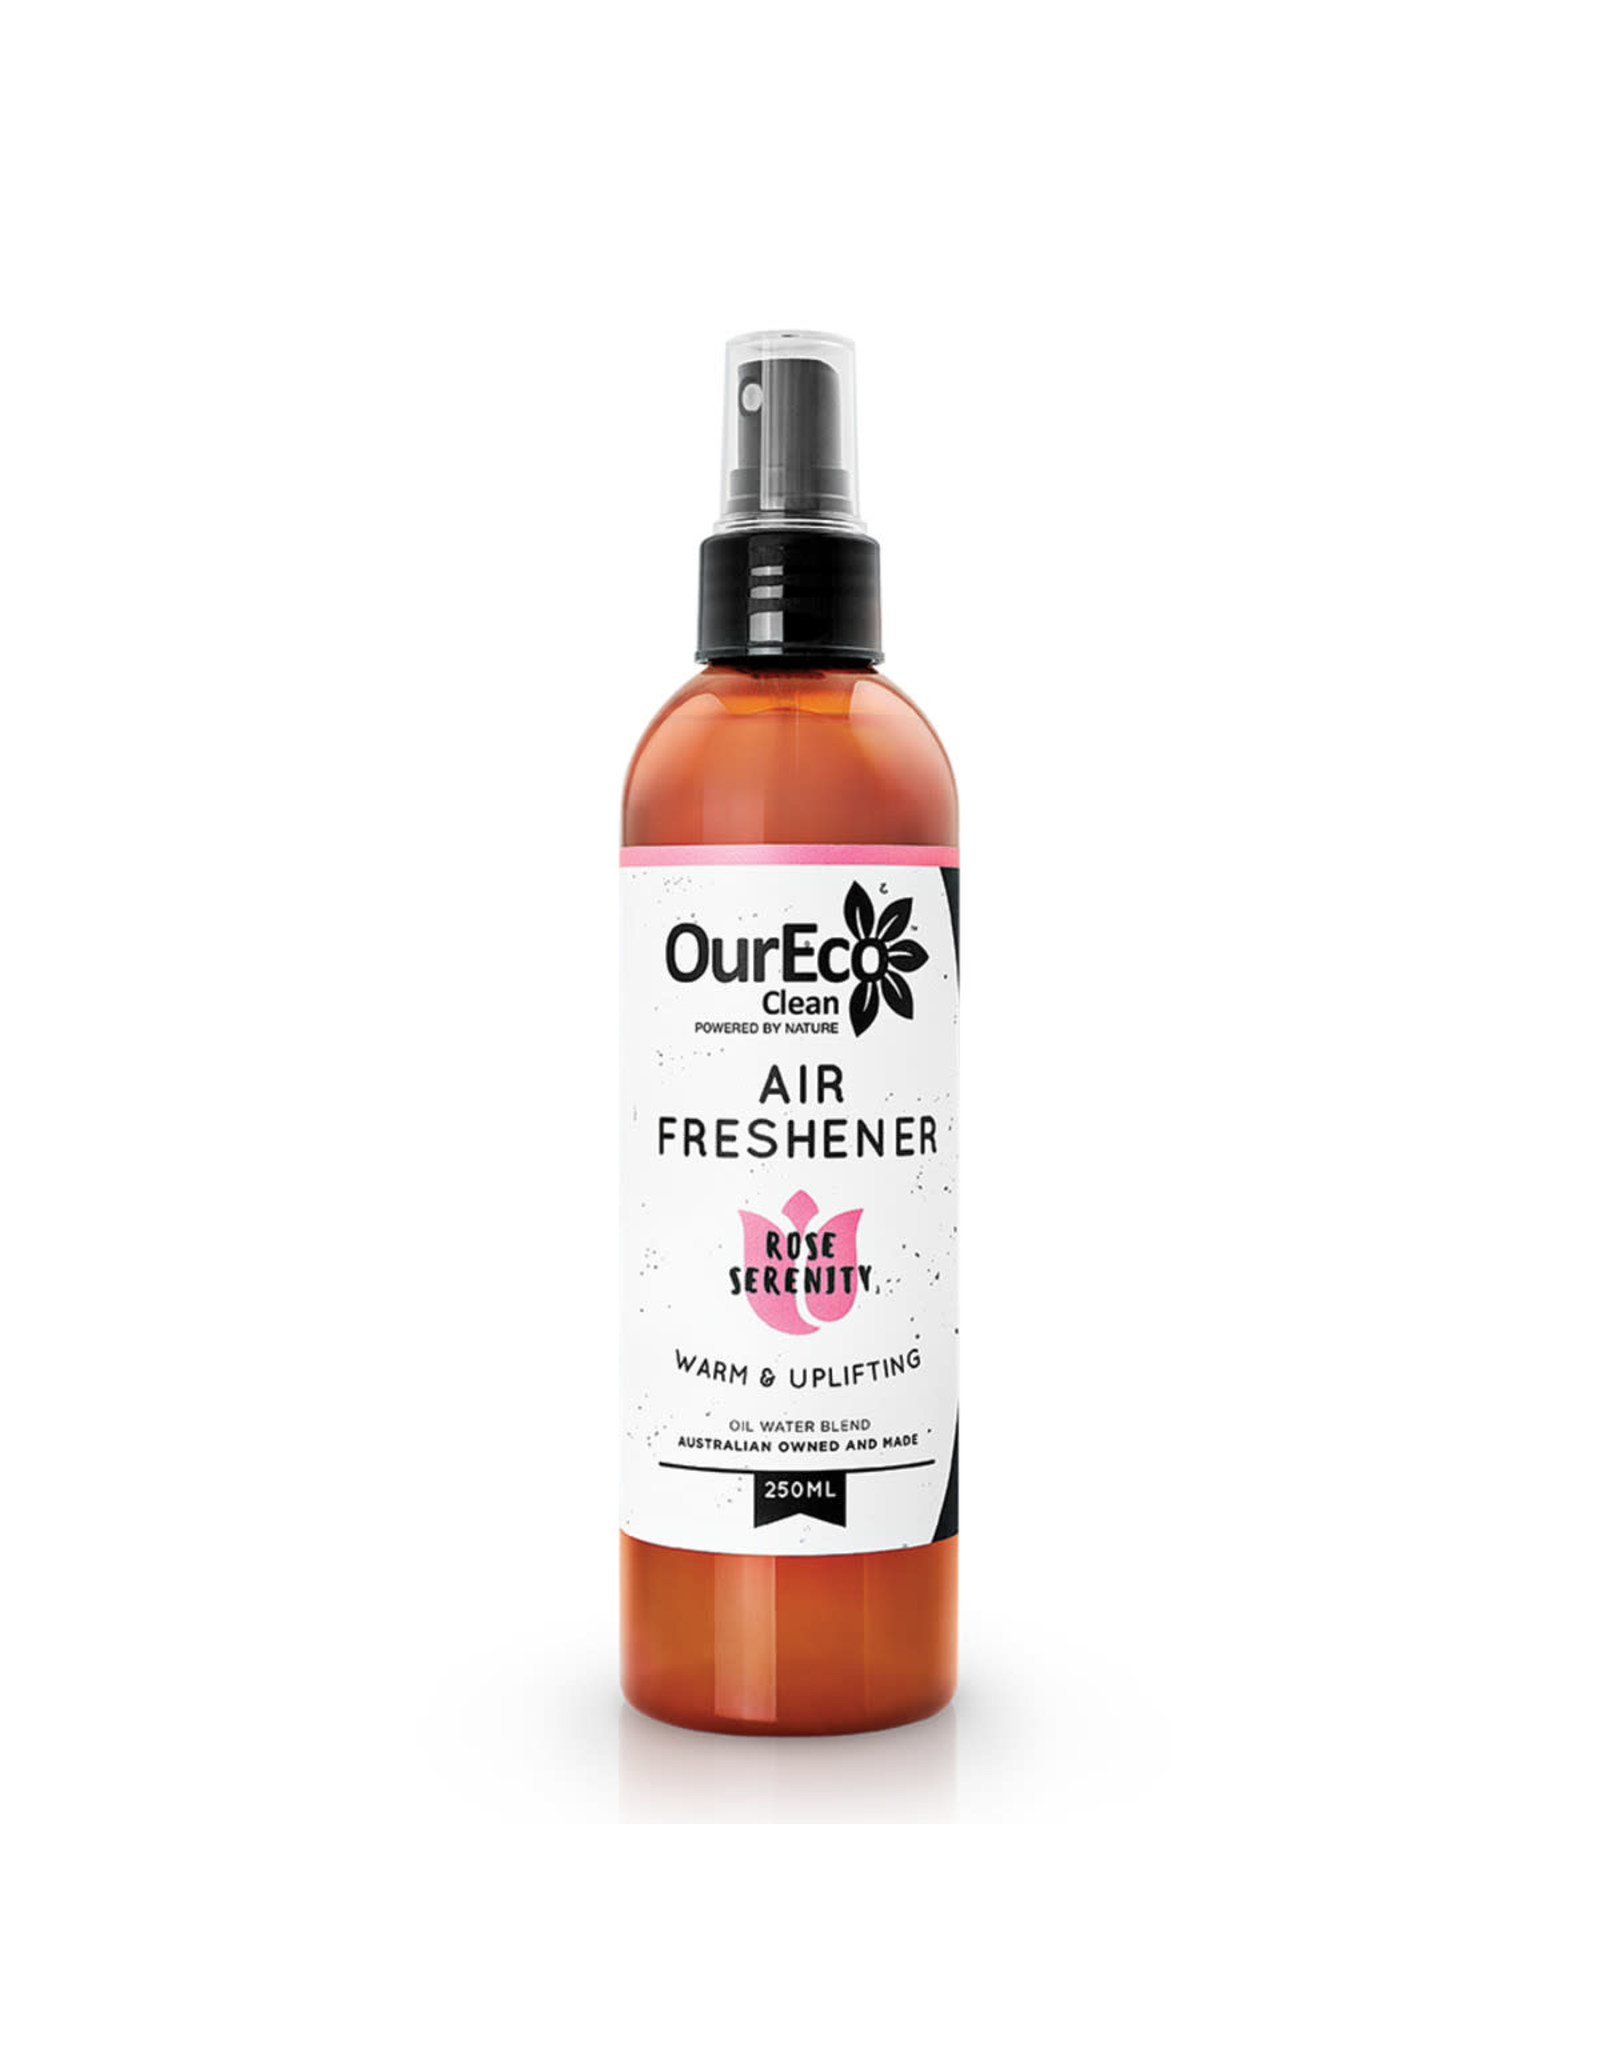 OurEco Air Freshener 250ML